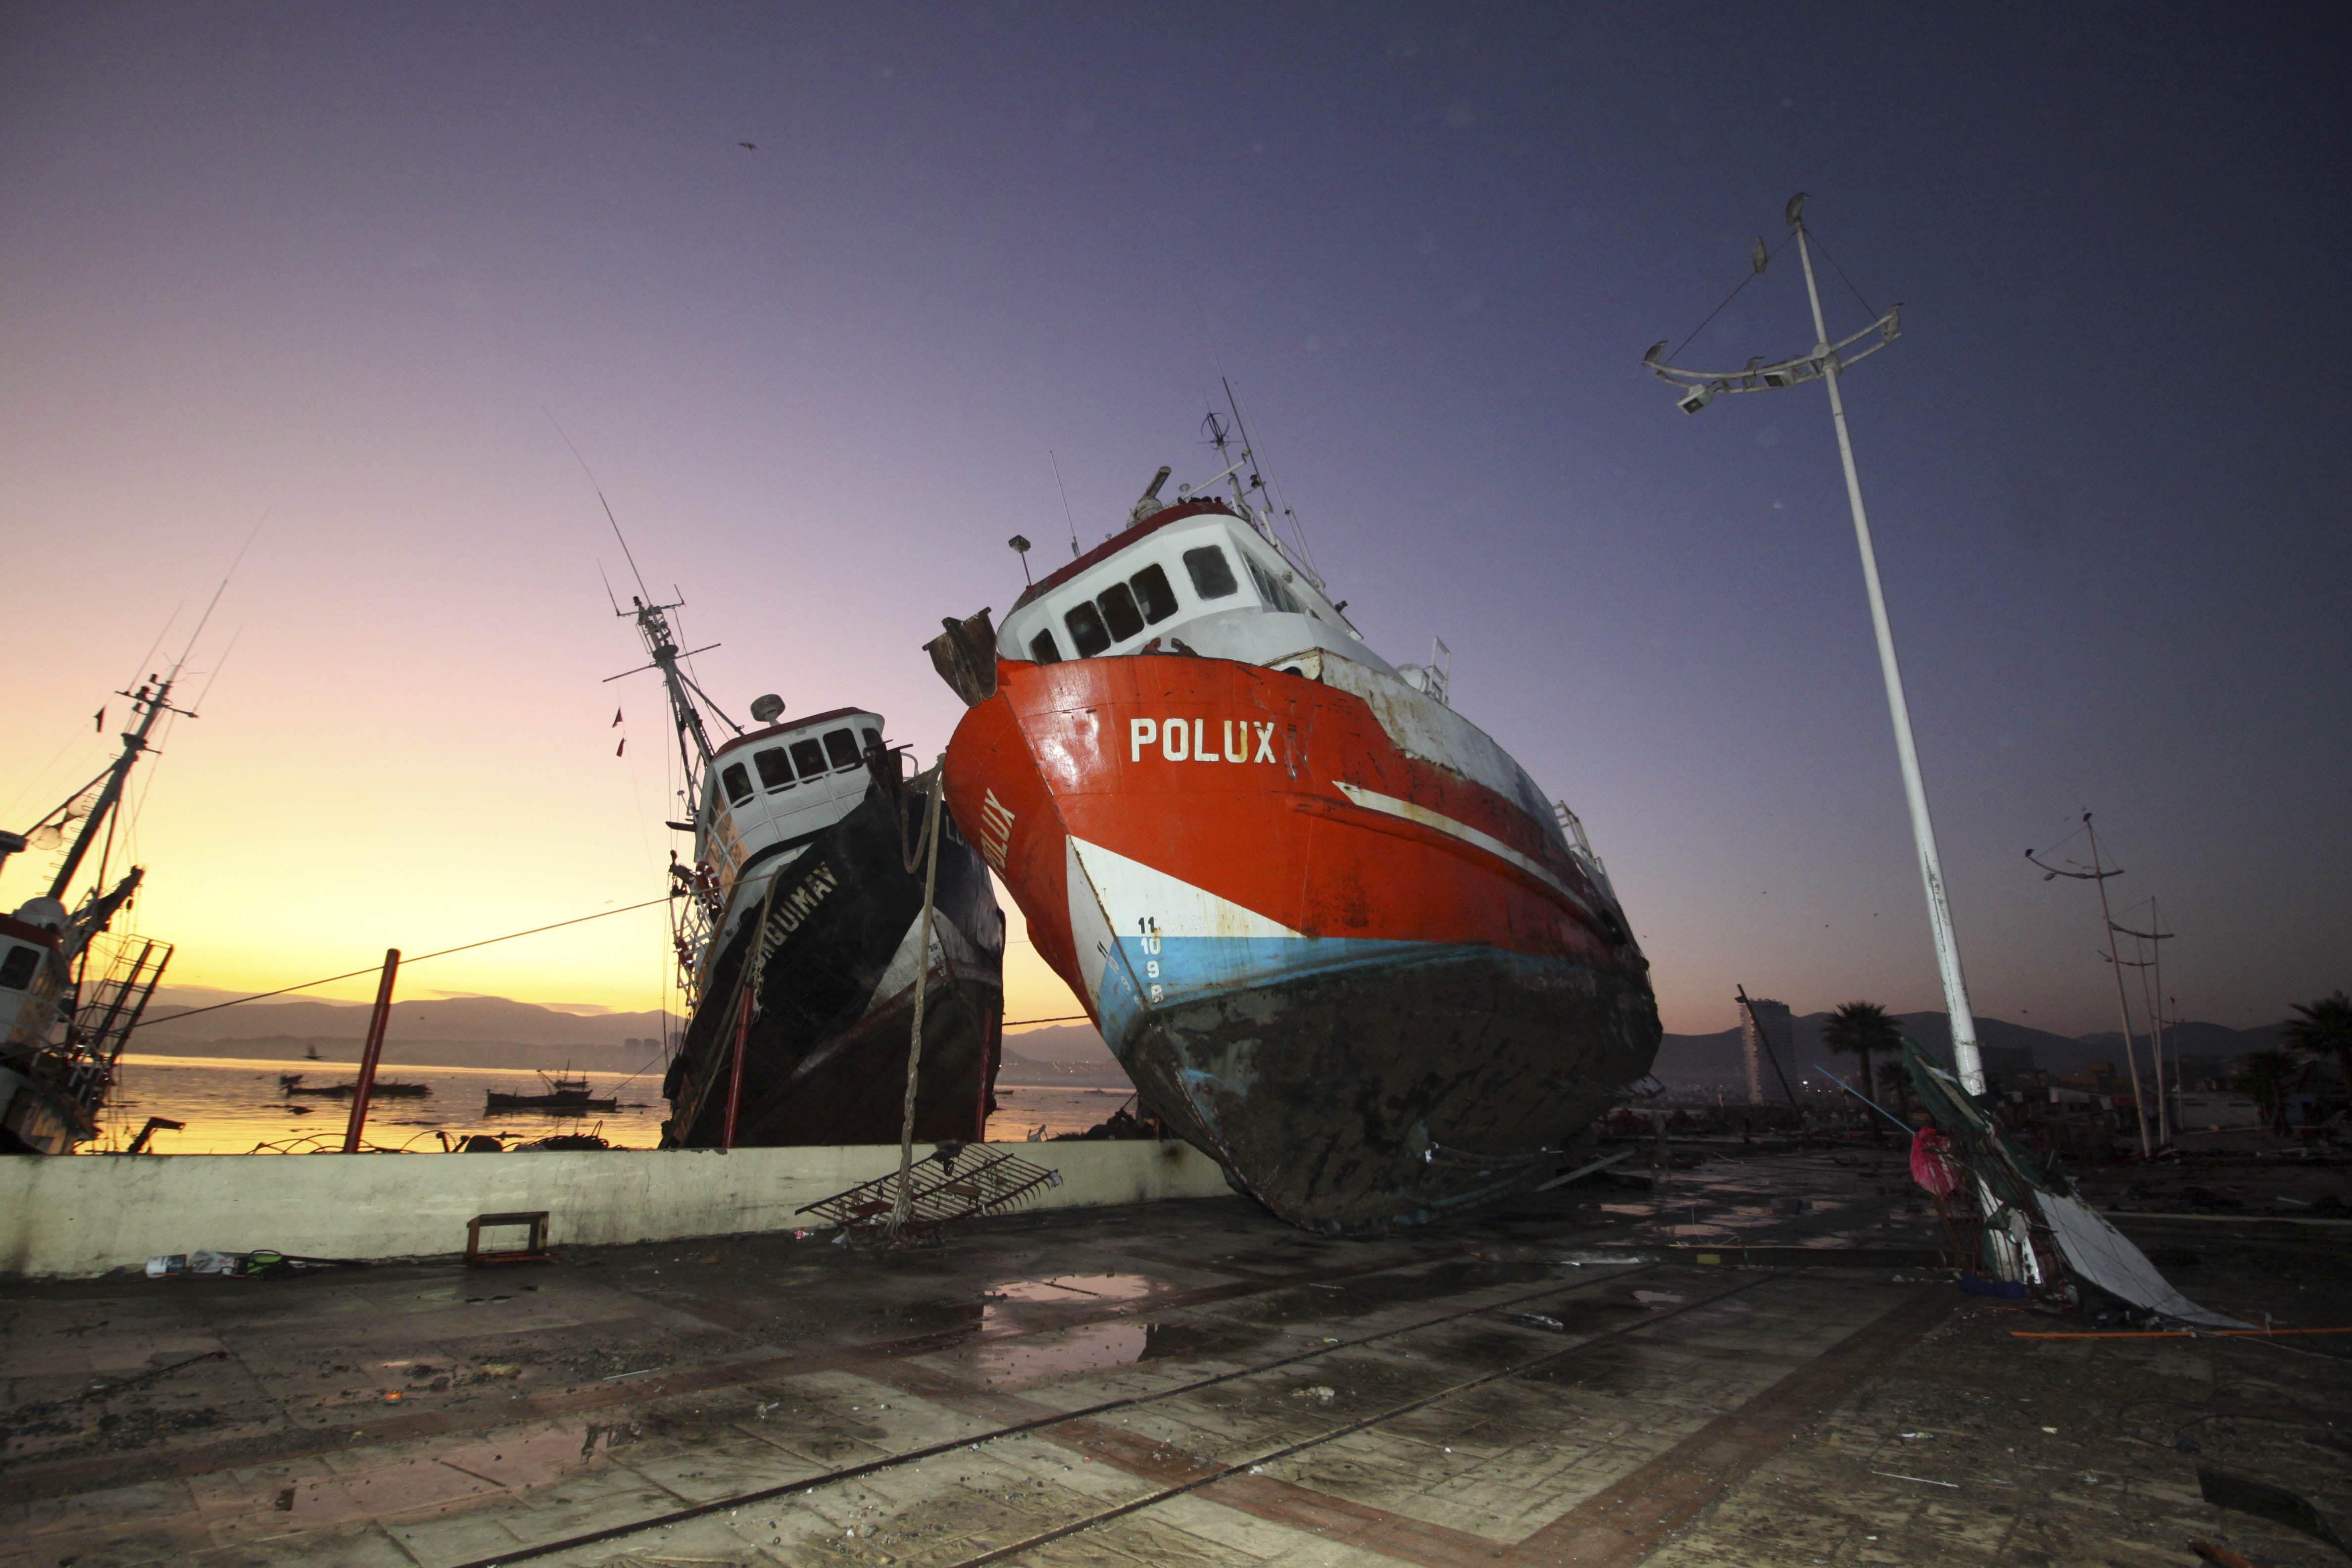 chile earthquake and tsunami devastation in photos